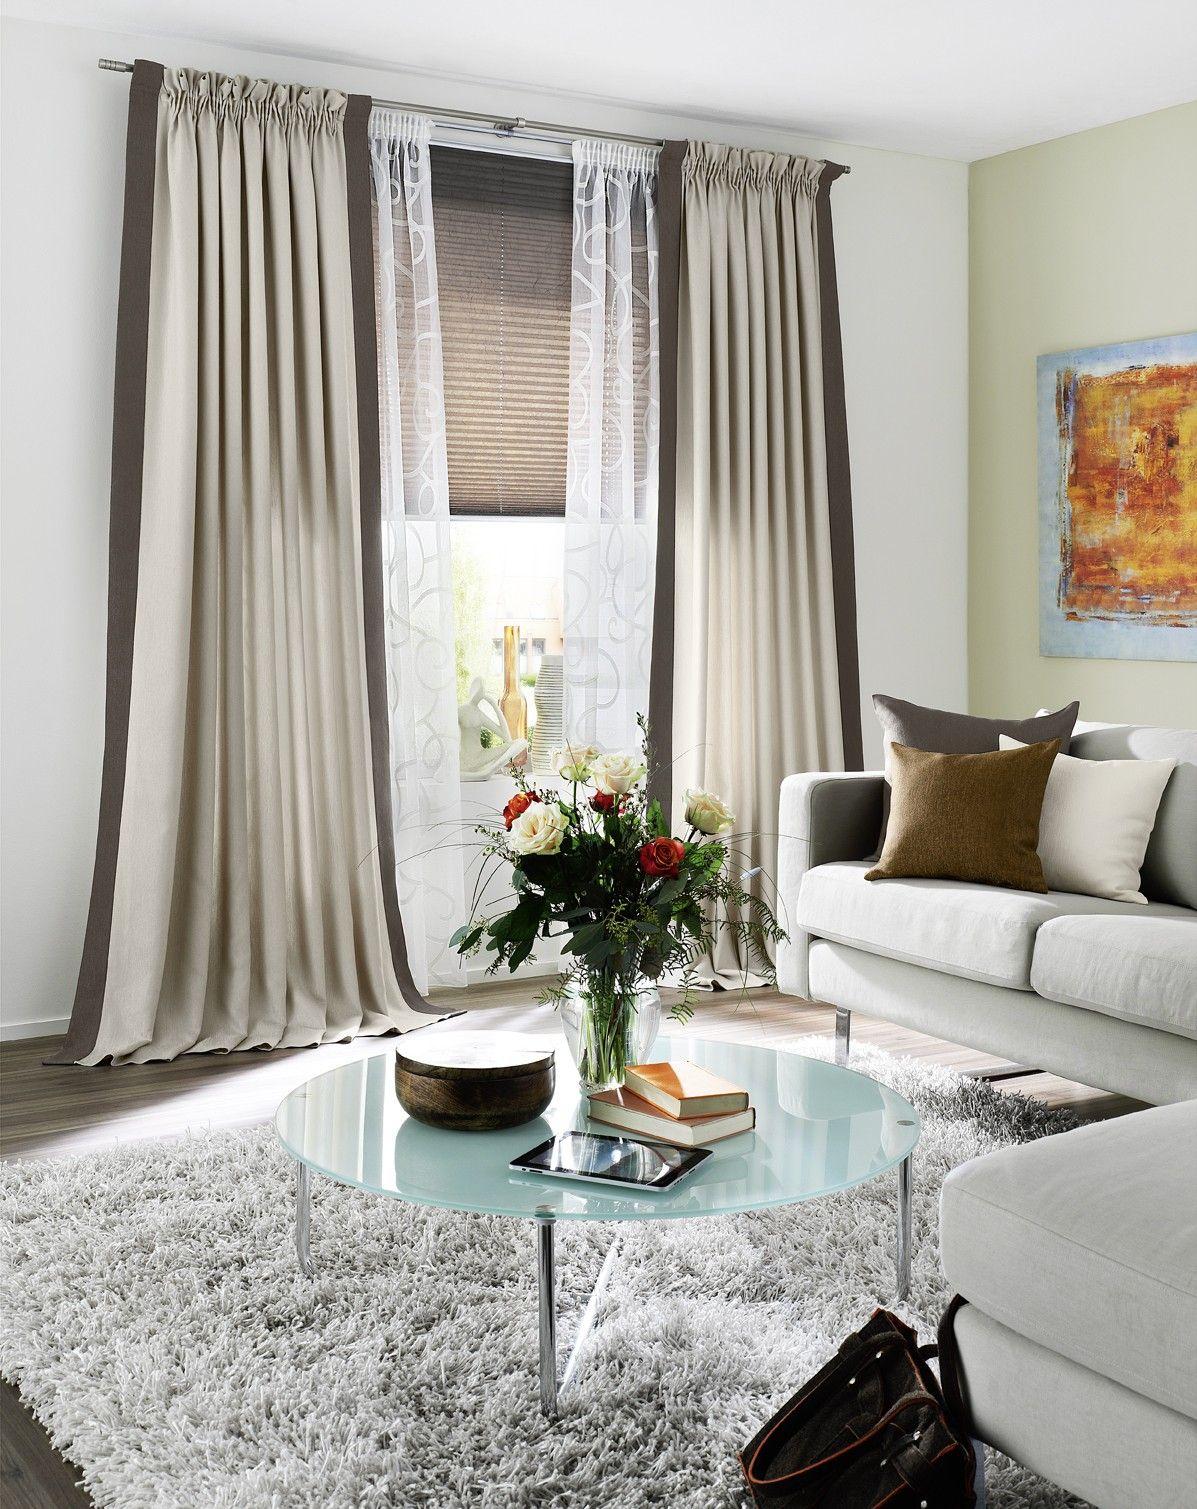 fenster granada gardinen dekostoffe wohnstoffe plissees rollos jalousien fl chenvorh nge. Black Bedroom Furniture Sets. Home Design Ideas